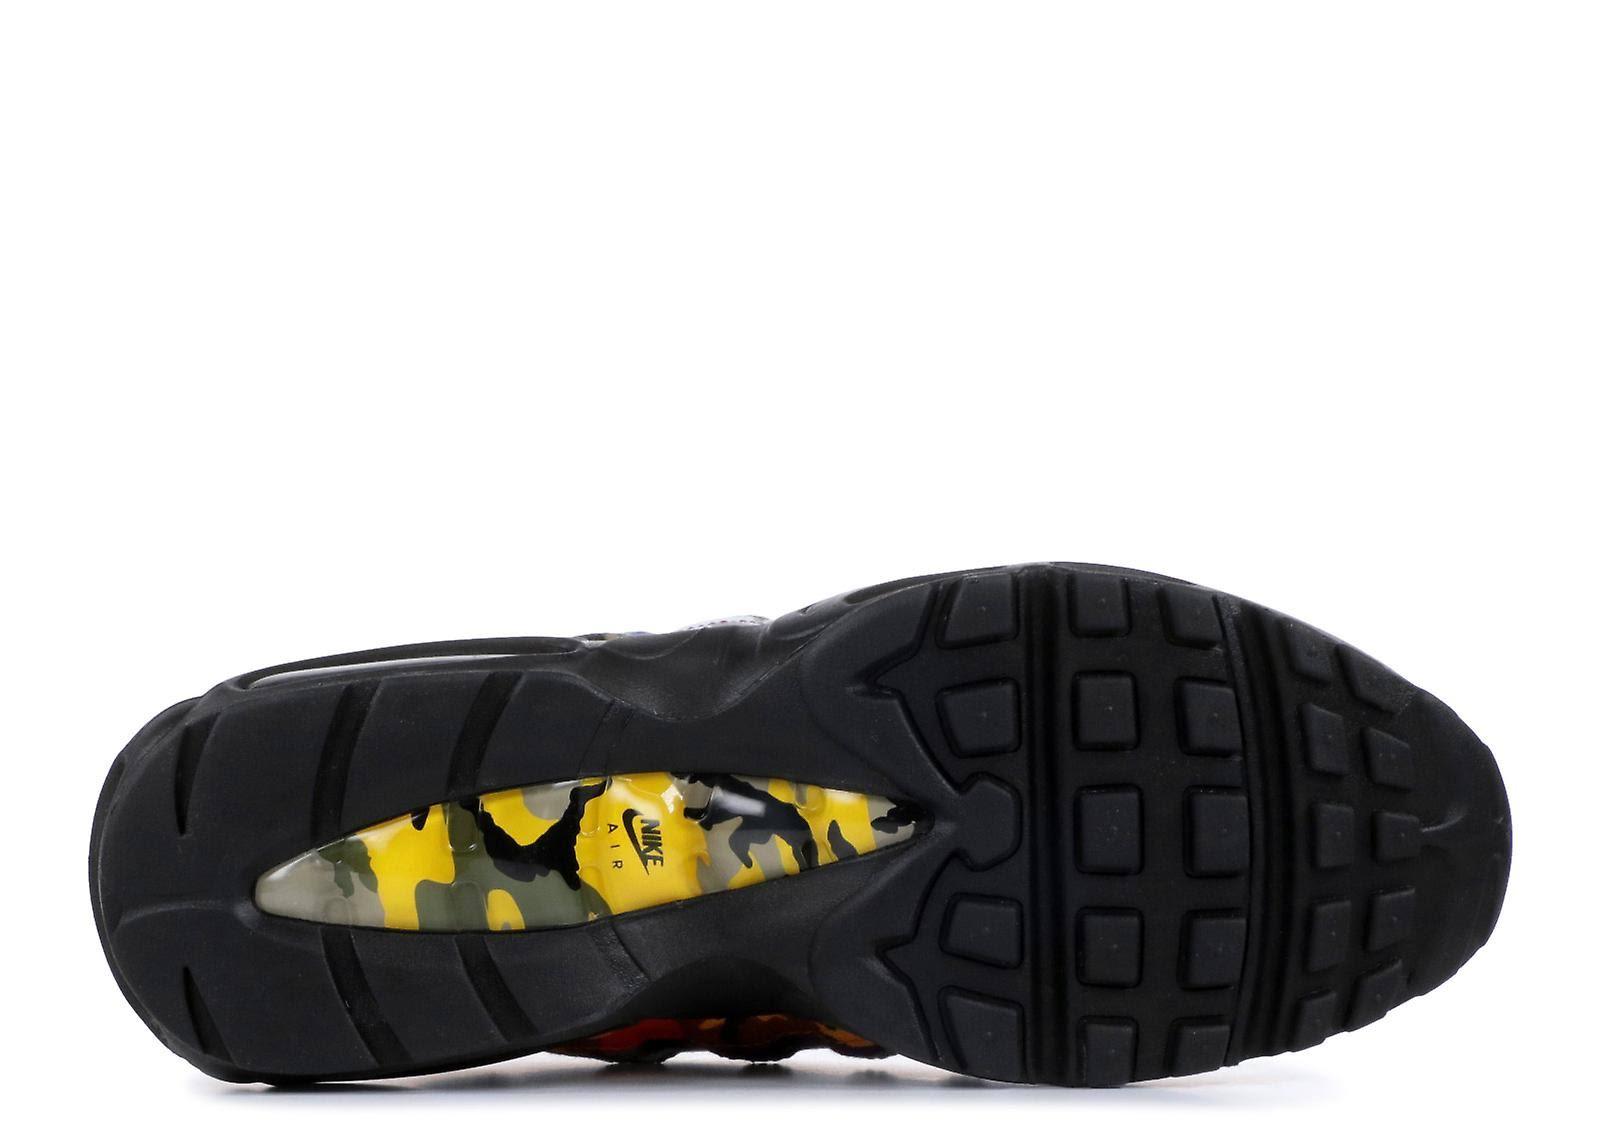 Nike Air Max 95 Erdl Party-Ar4473-001-scarpe 3.5 UK